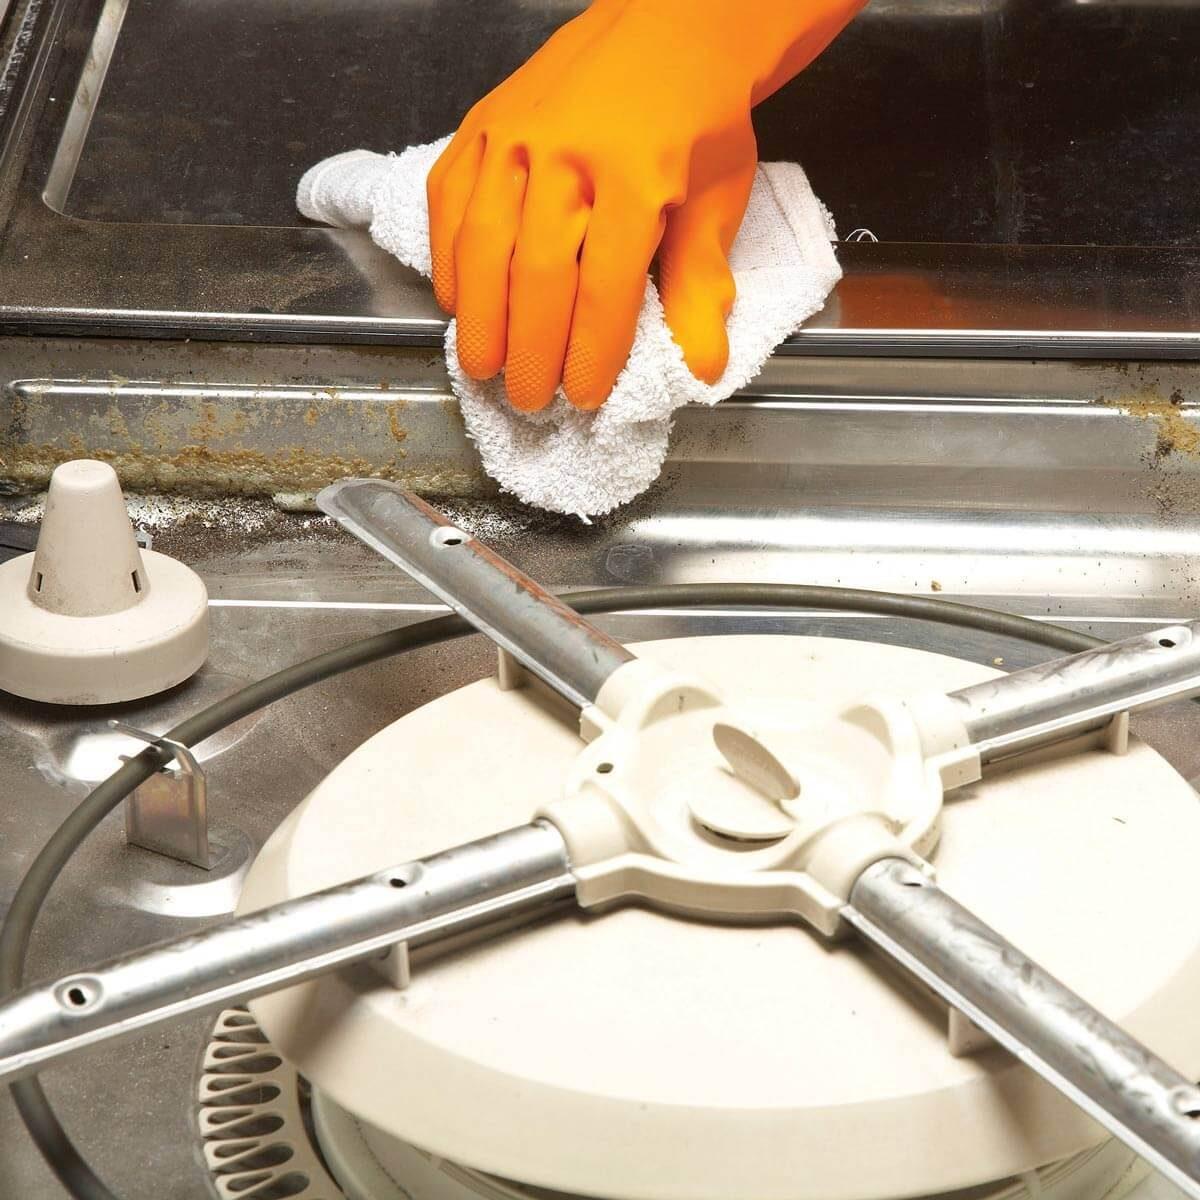 FH10NOV_513_05_026 clean the dishwasher